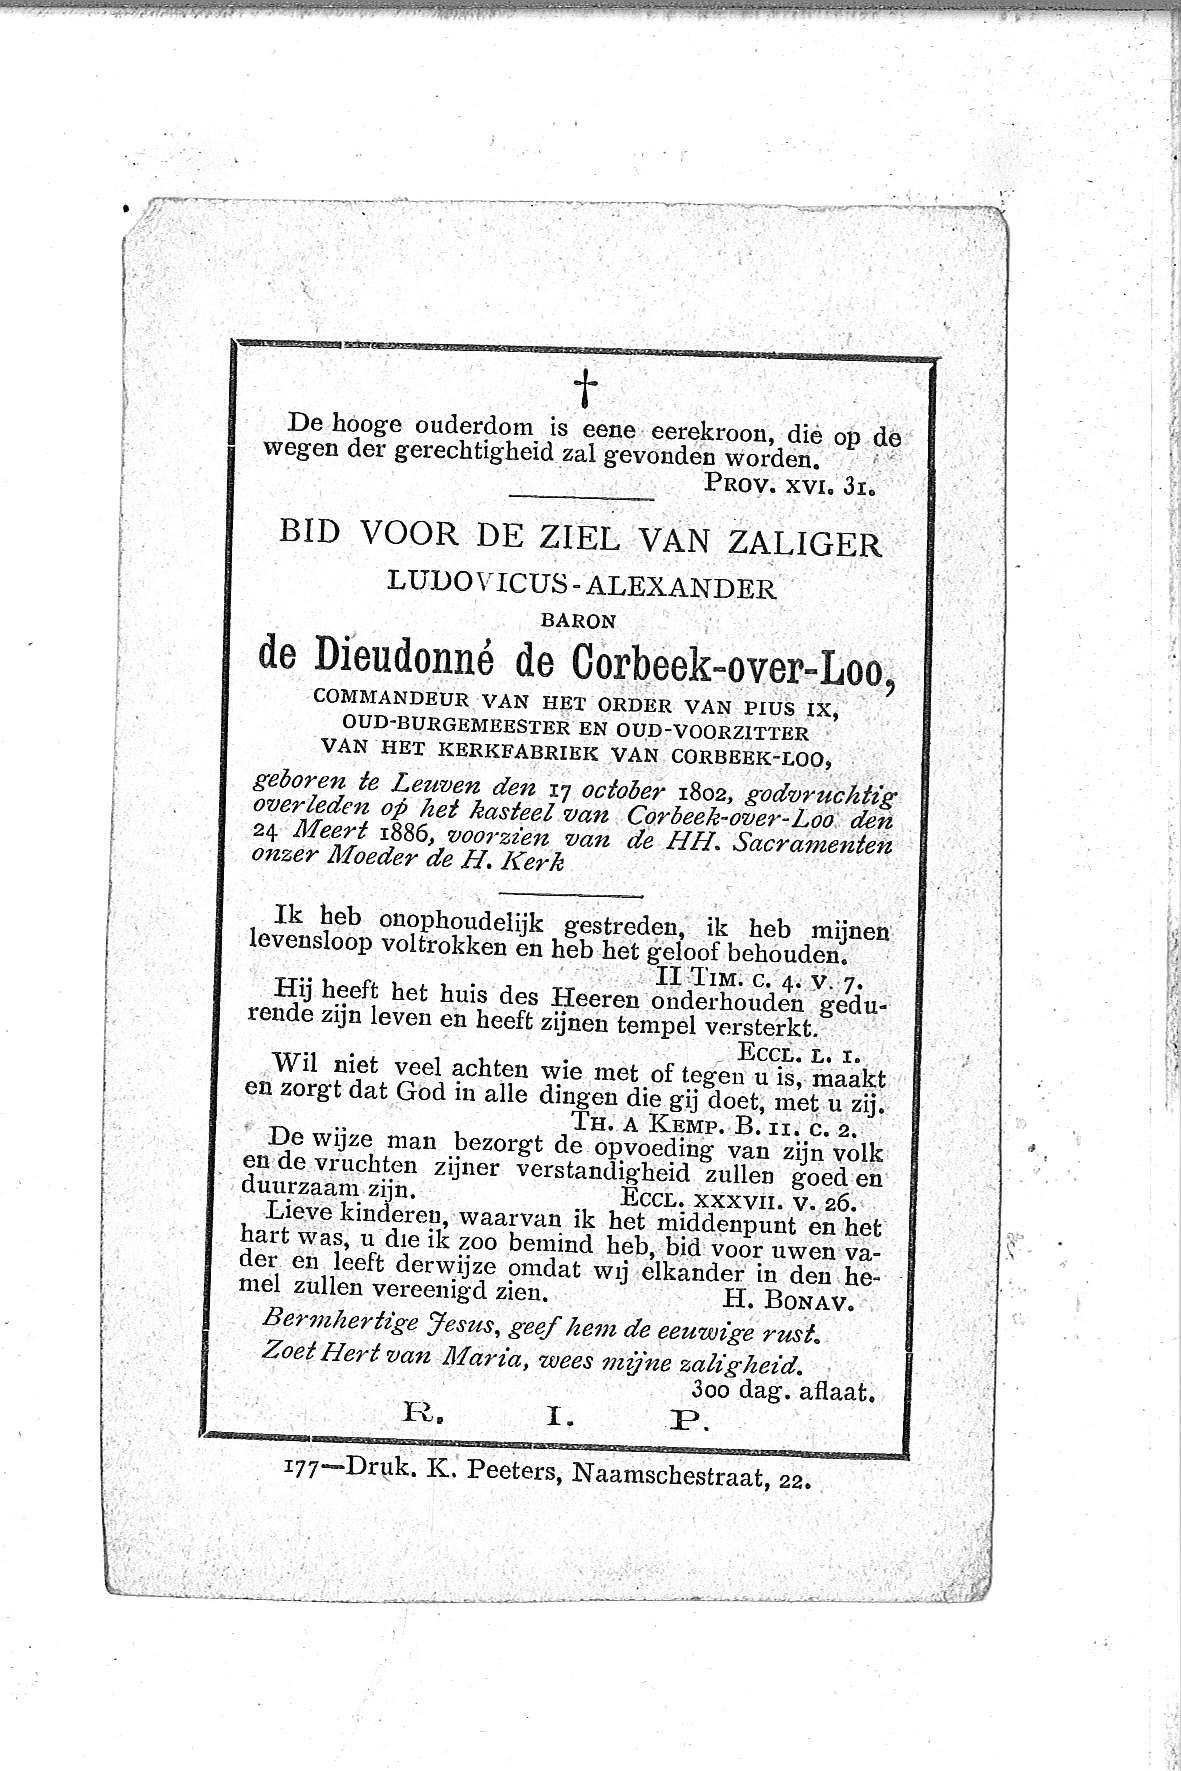 Ludovicus-Alexander-(1886)-20121025121318_00002.jpg